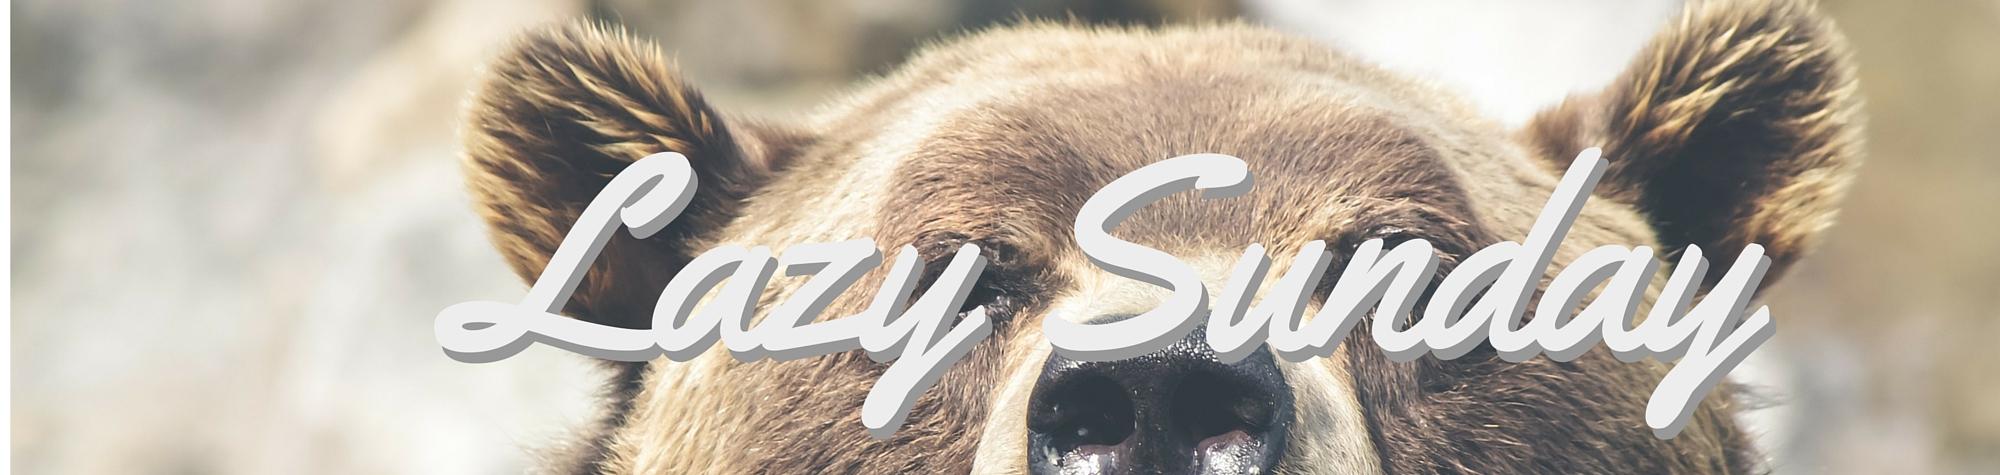 Wpis-Header lazy sunday-8